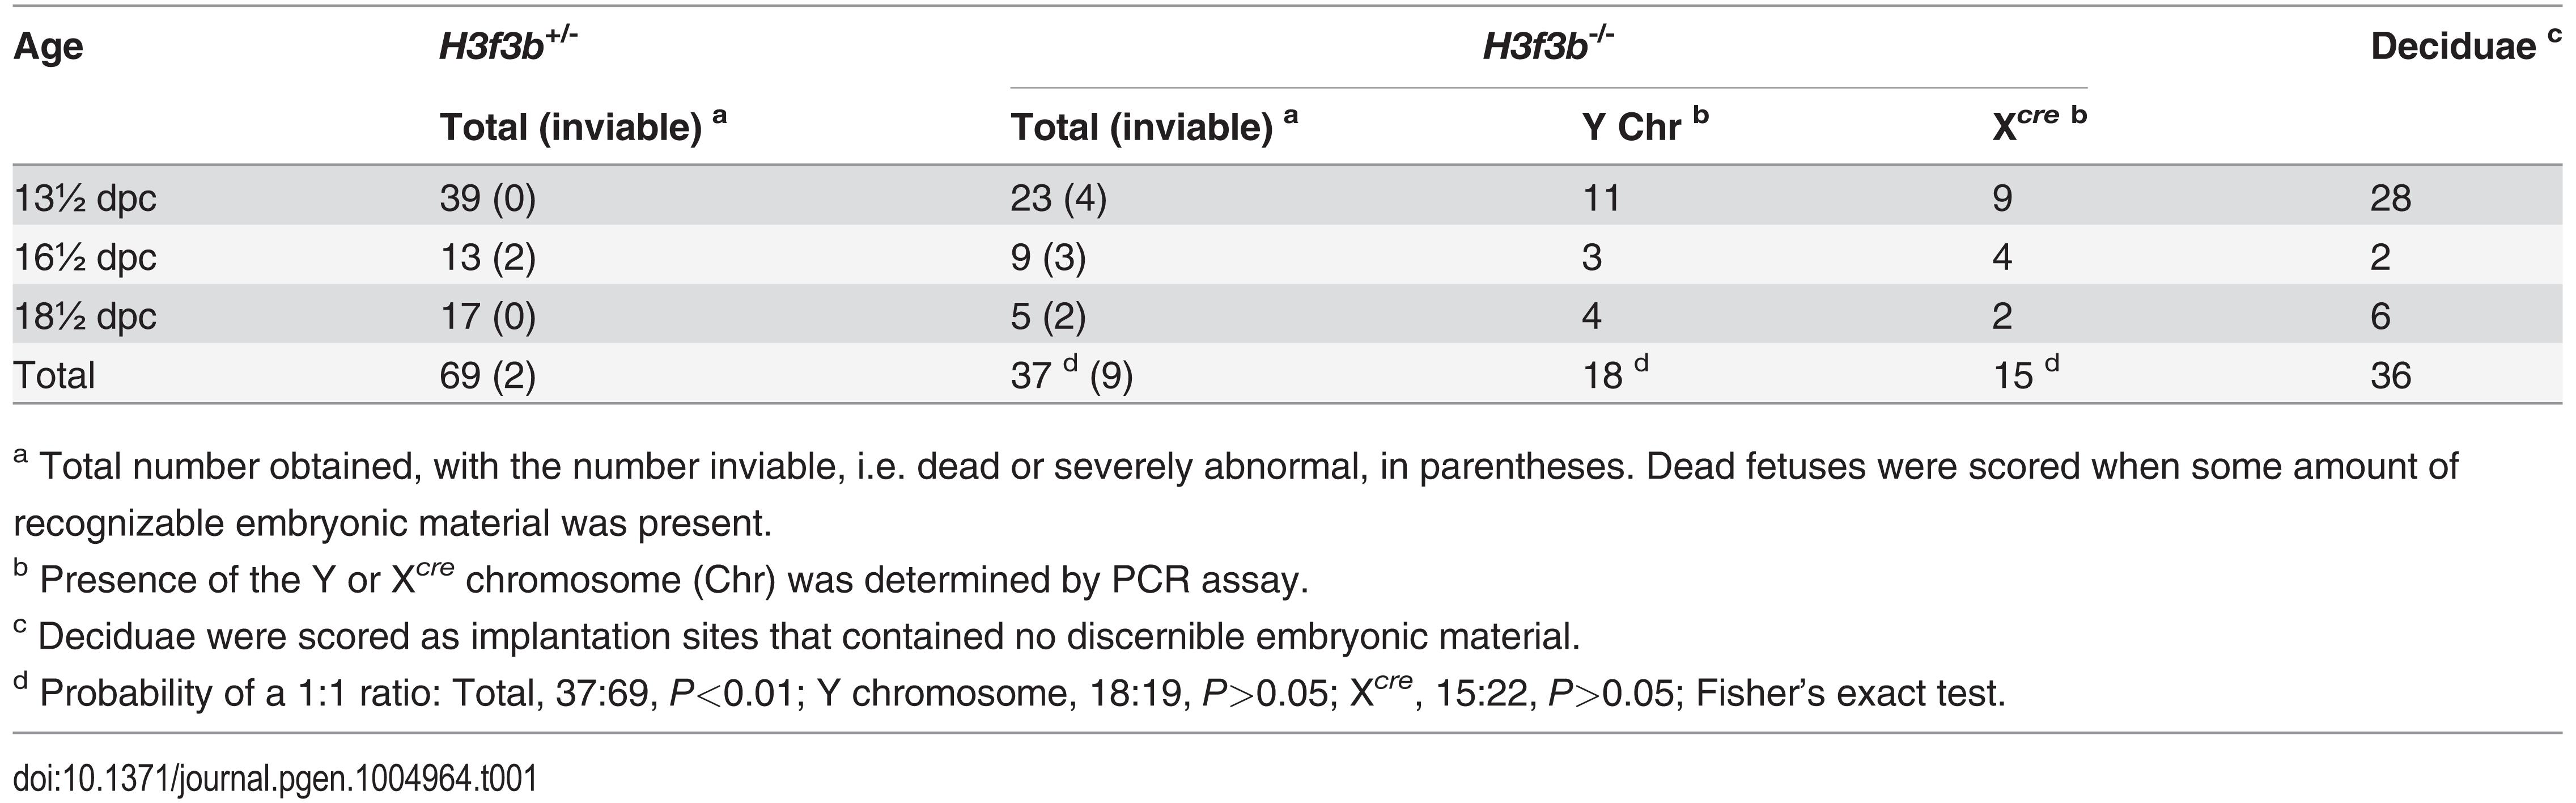 Survival of <i>H3f3b</i> mutant fetuses.